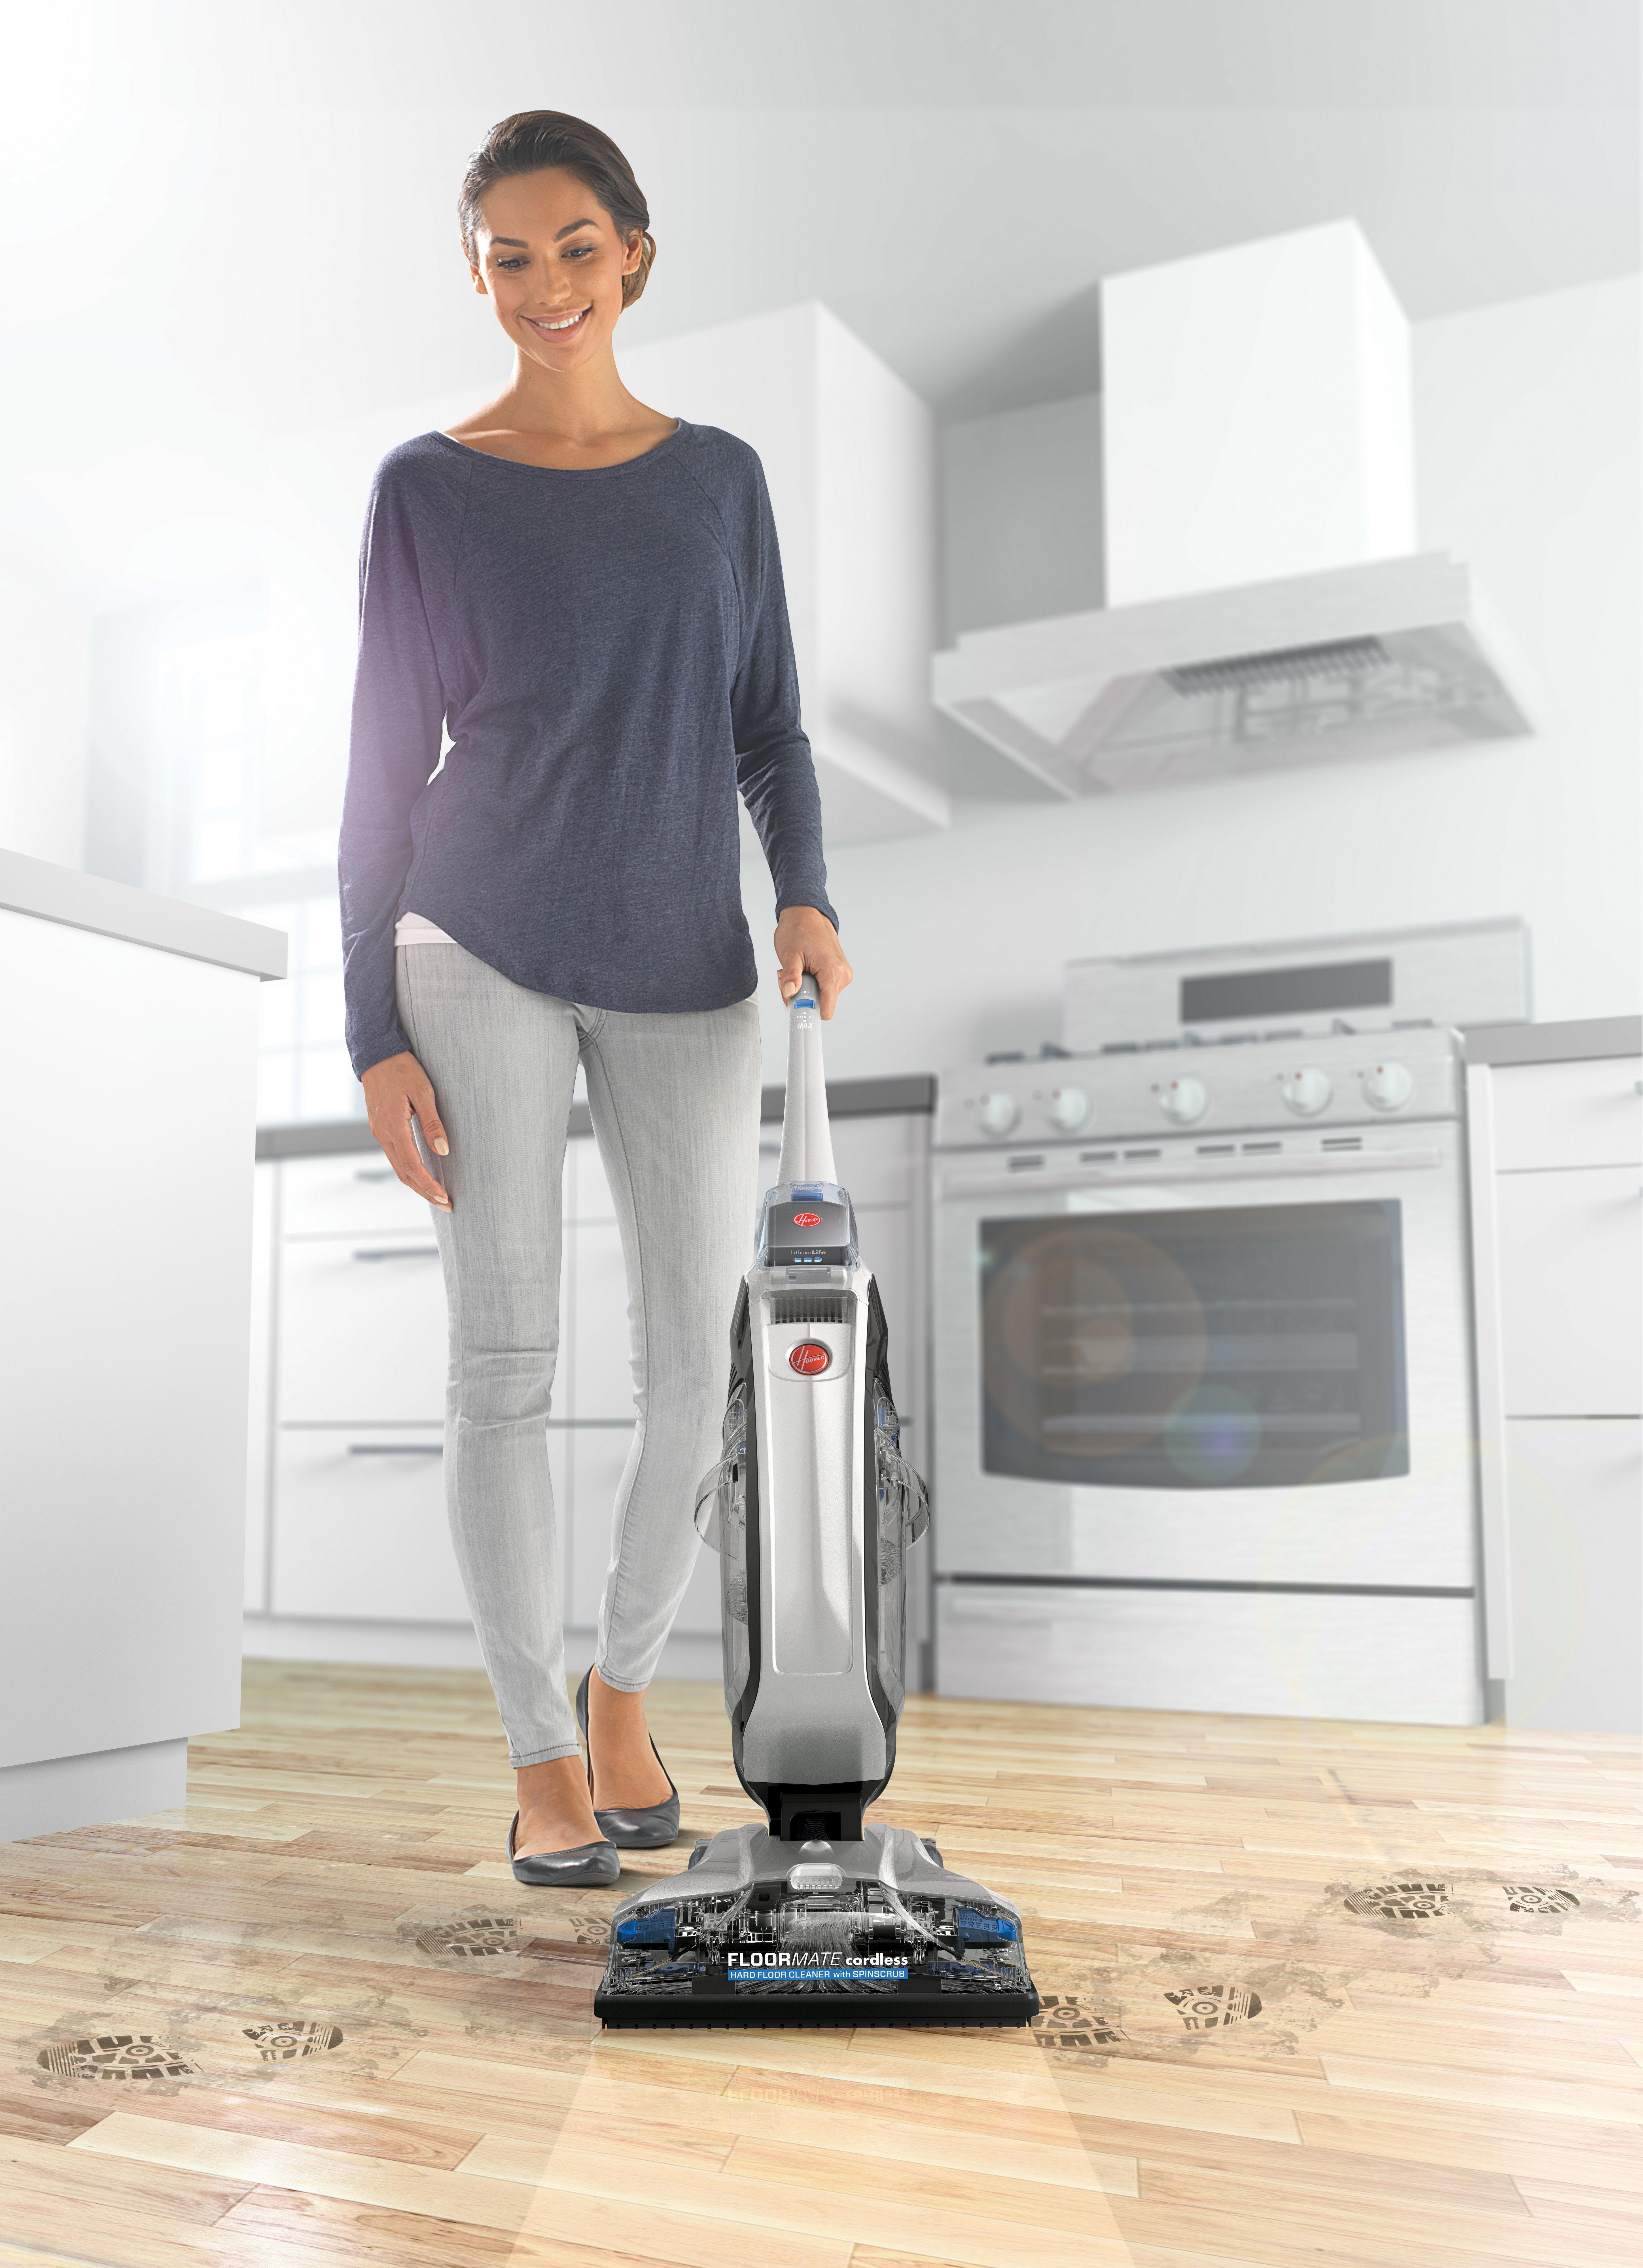 FloorMate Cordless Hard Floor Cleaner4